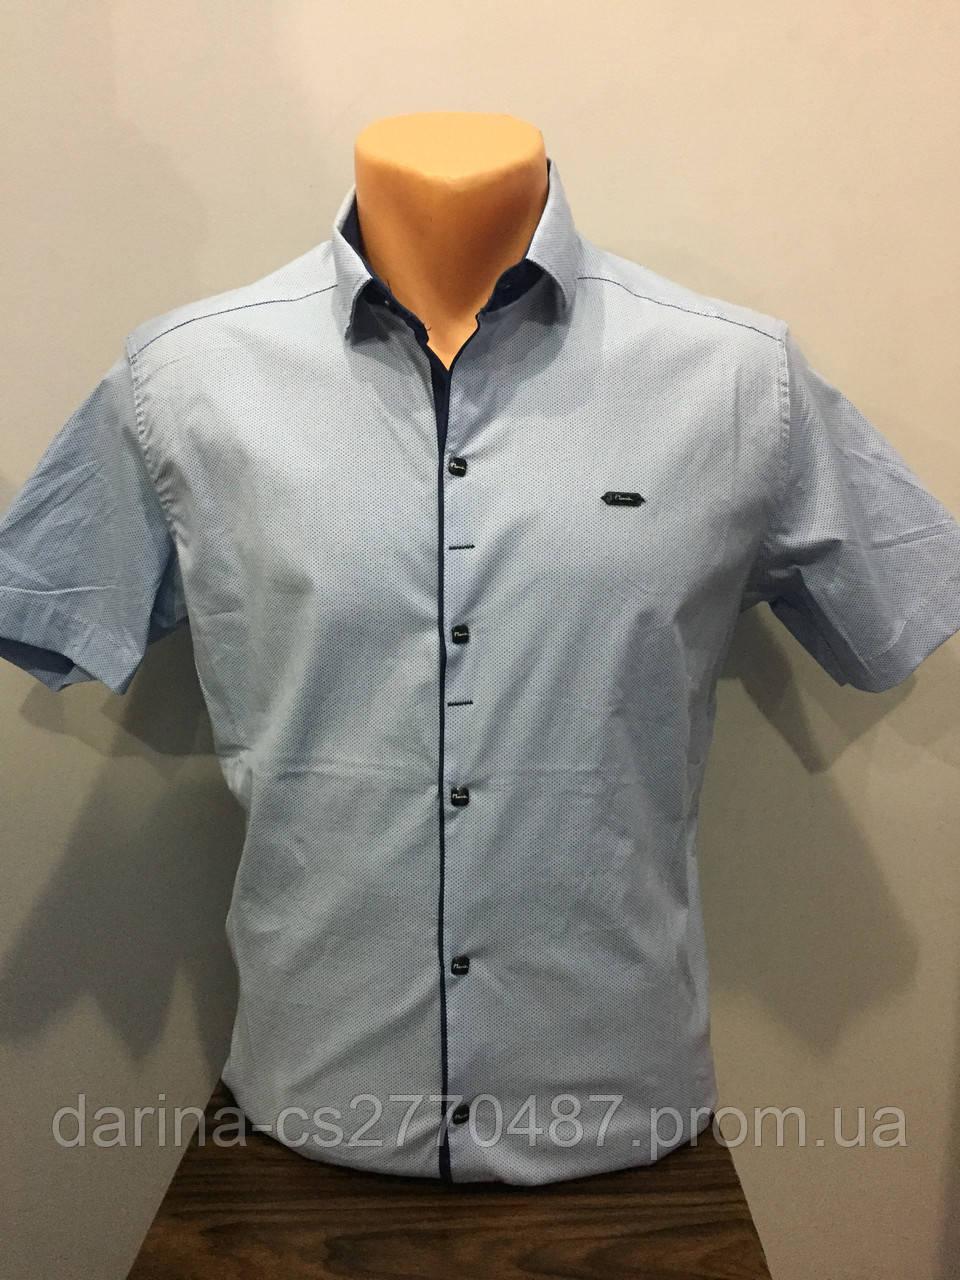 Рубашка на кнопках для мужчины S-XL